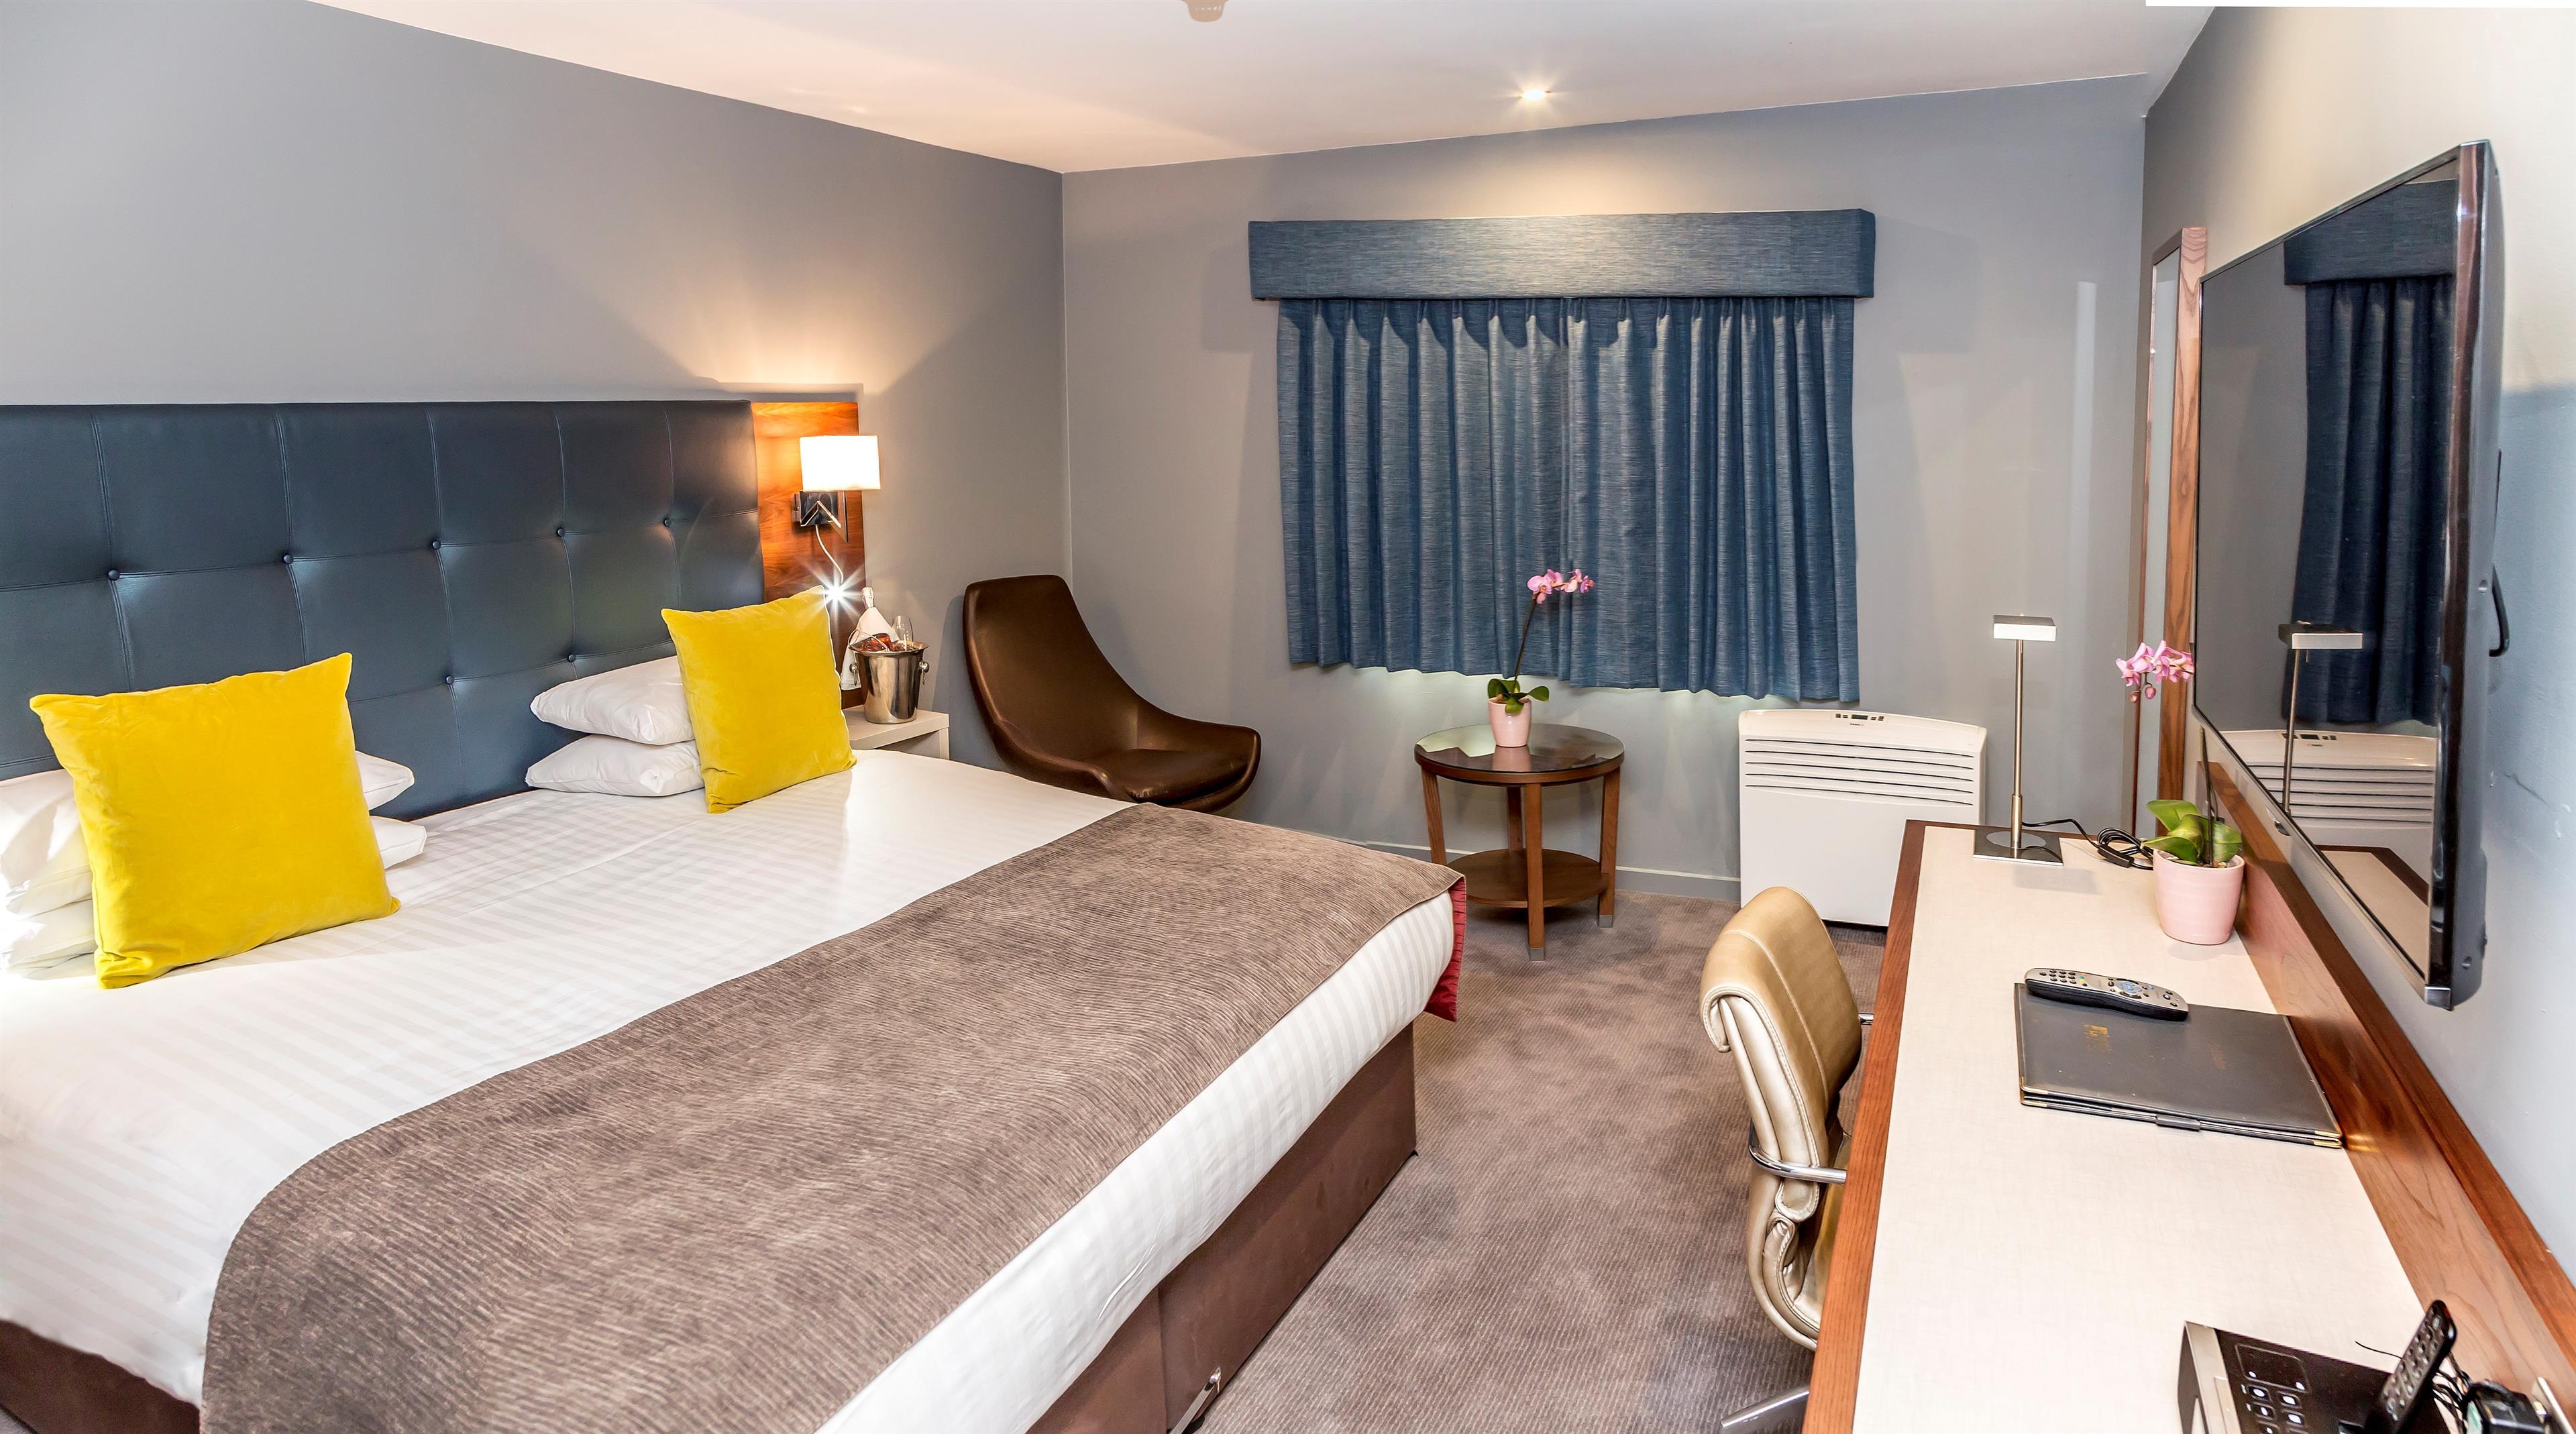 best western atlantic hotel hotels in chelmsford cm1 1pp. Black Bedroom Furniture Sets. Home Design Ideas